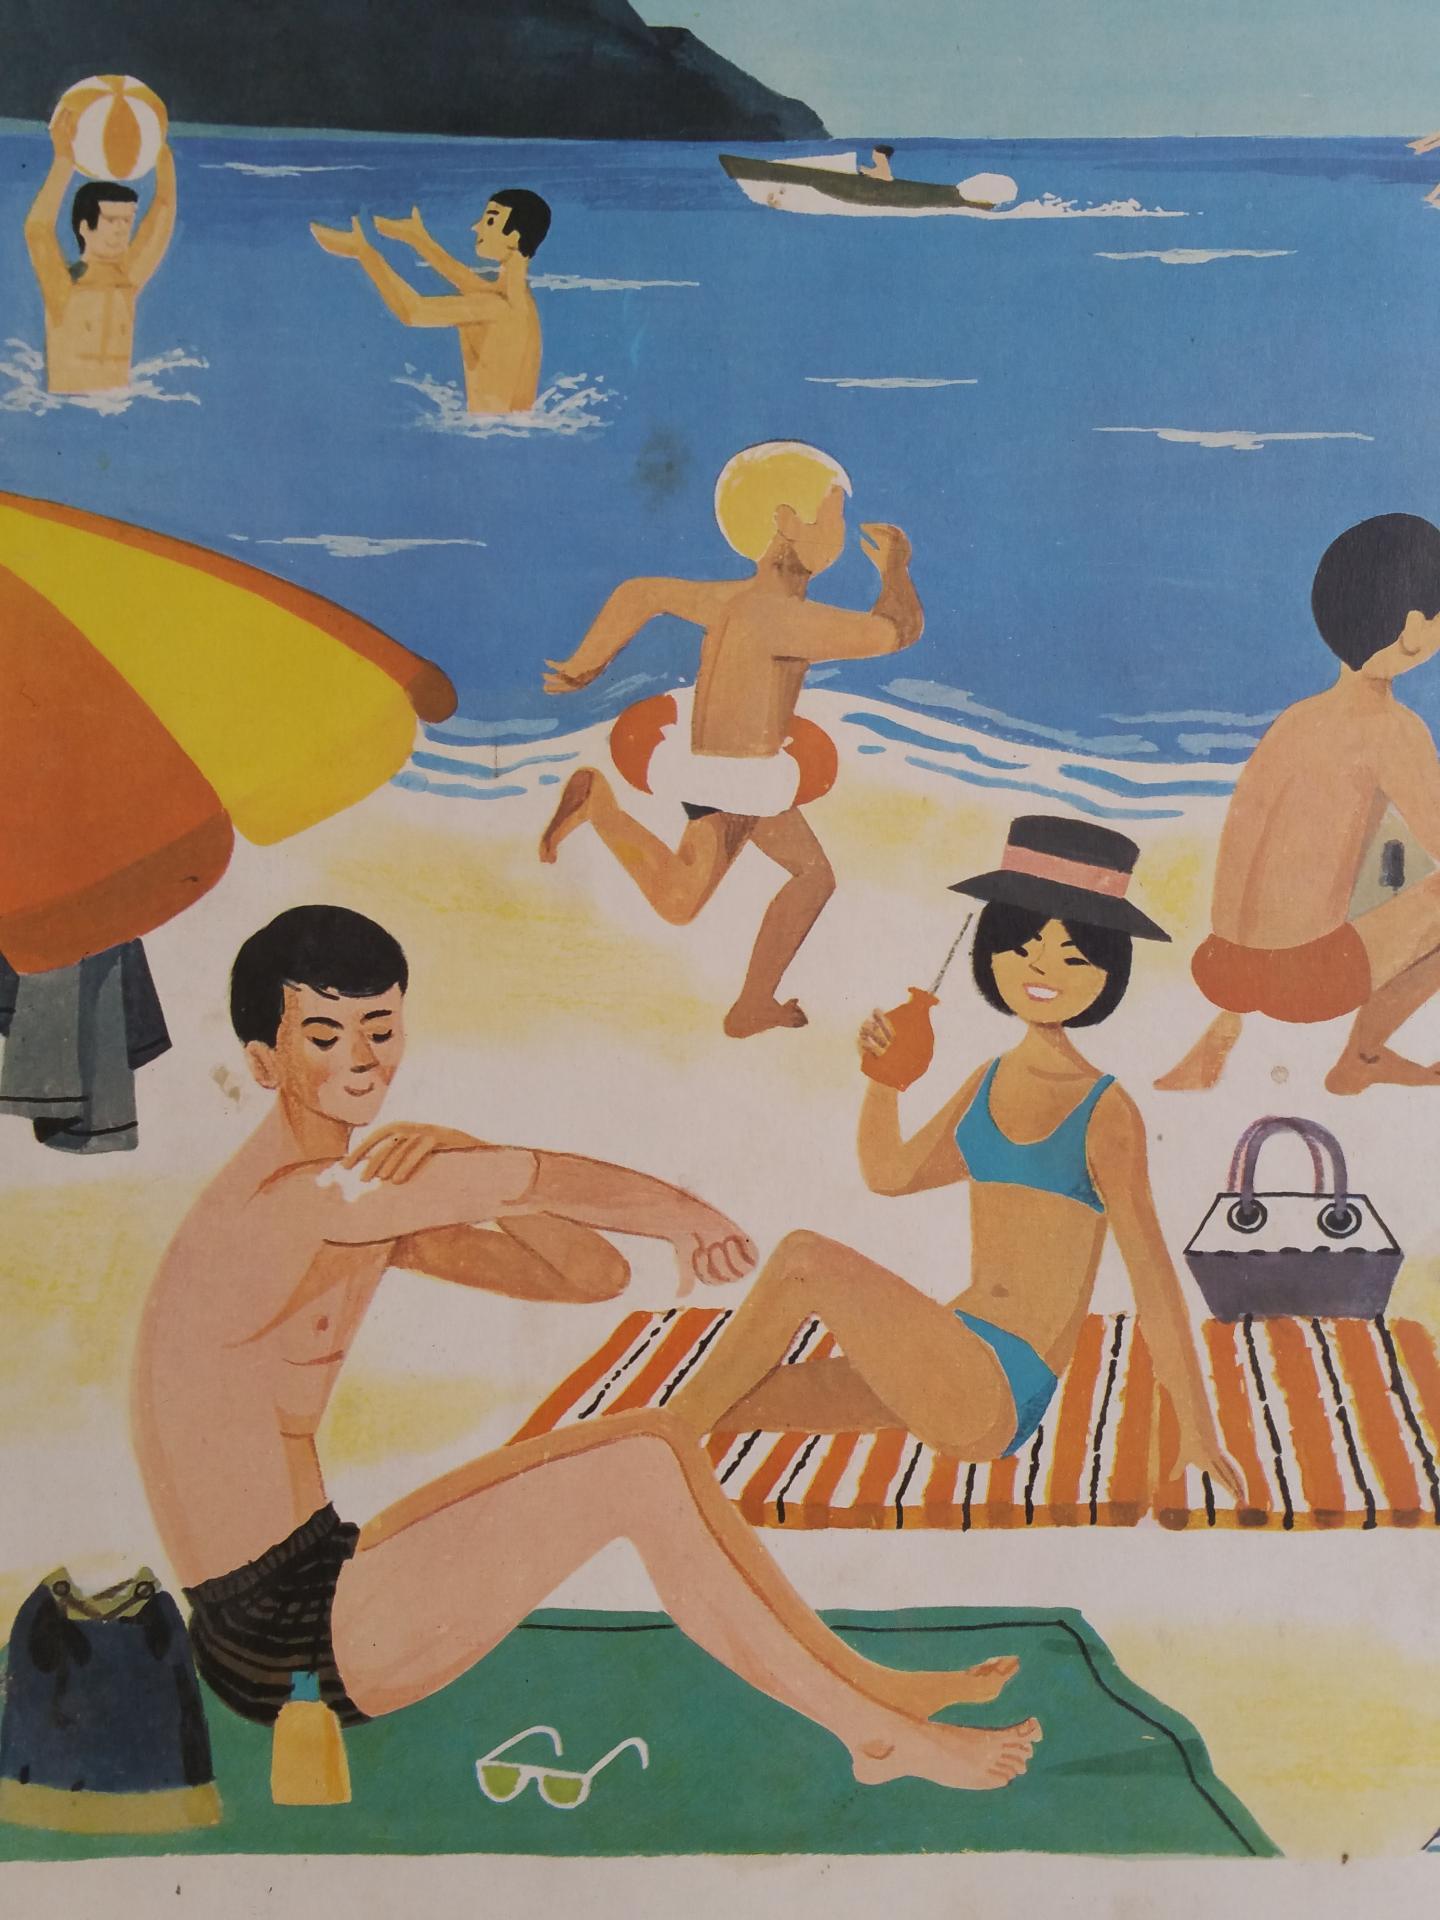 01 affiche peche plage